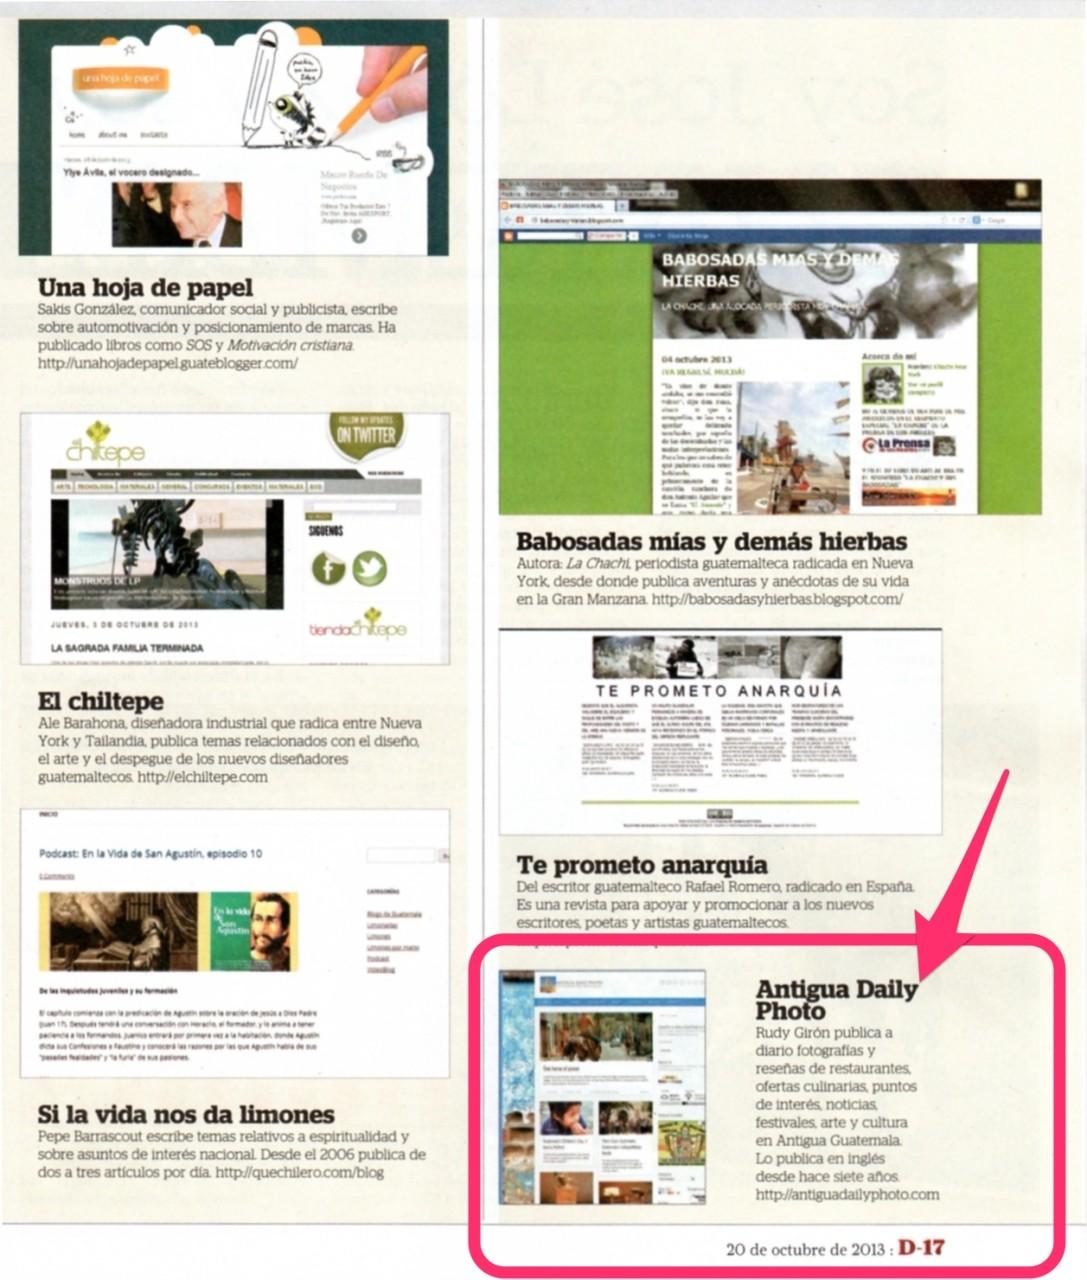 AntiguaDailyPhoto entre los 10 mejores de Guatemala según Revista D de Prensa Libre